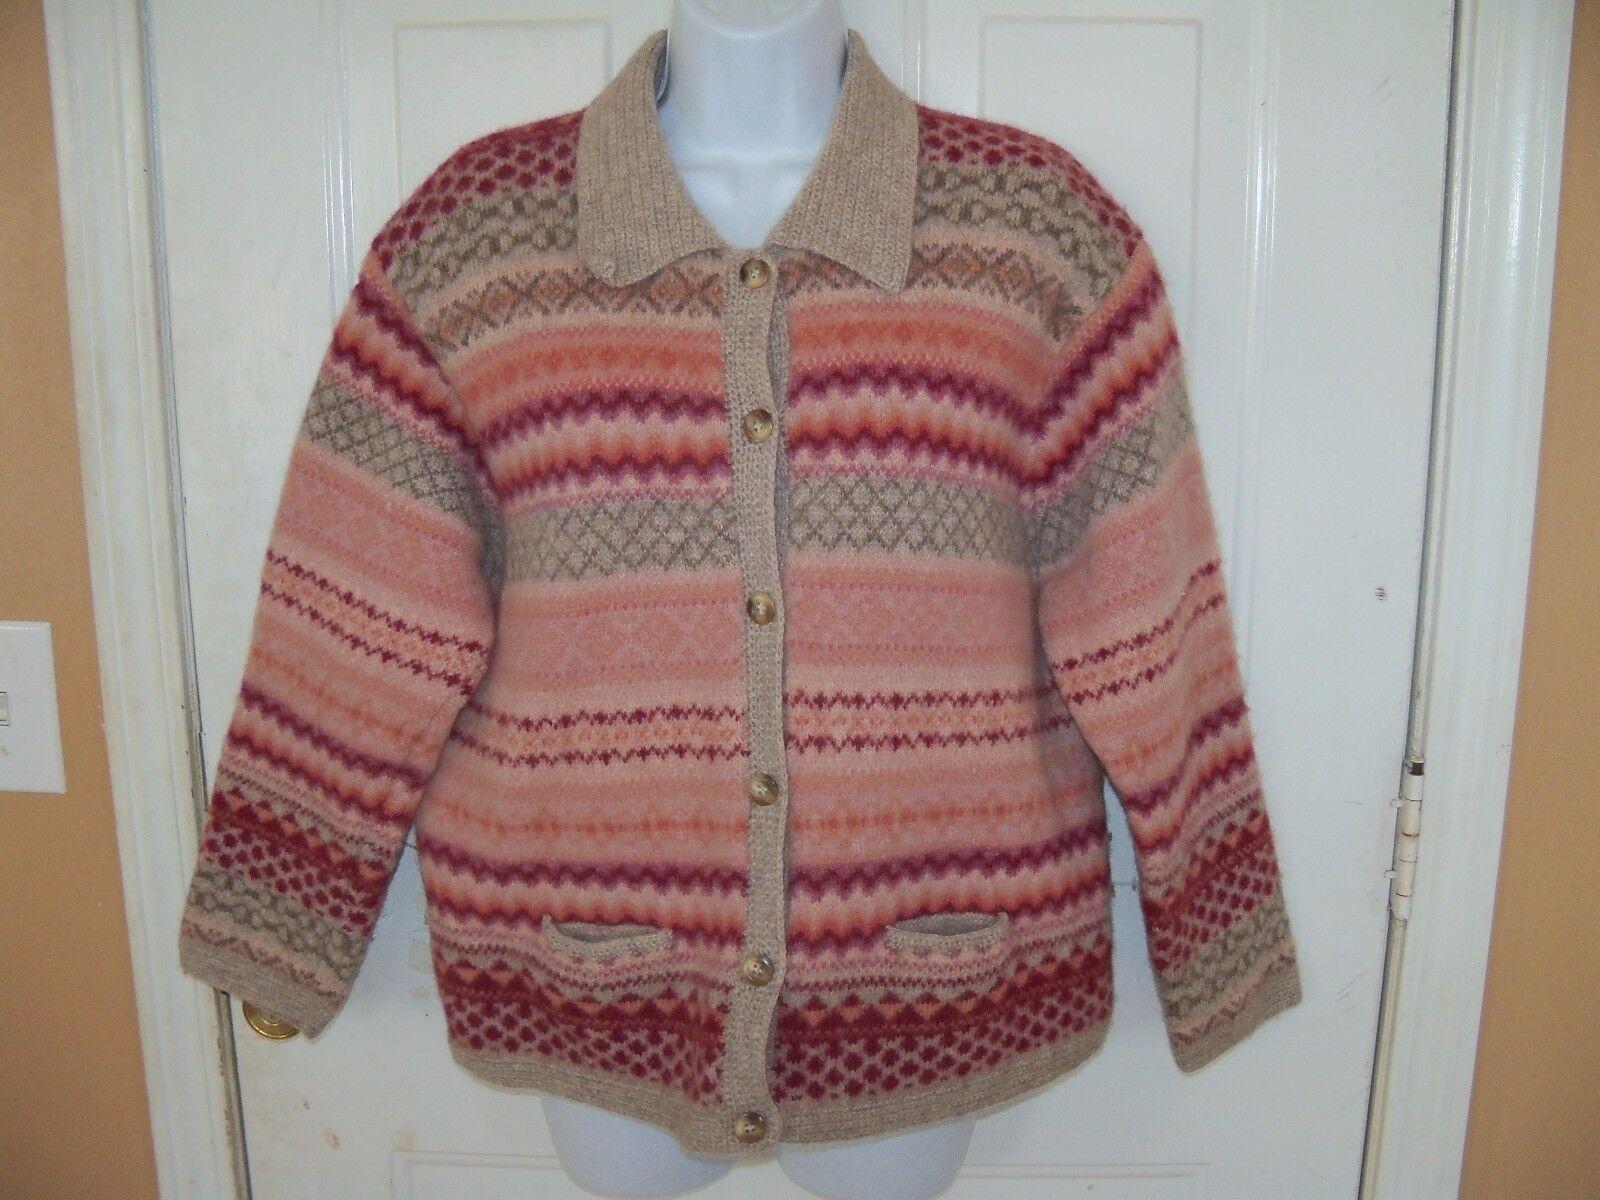 Vintage Susan Bristol 100% Wool Cardigan Sweater Multi color Size M L WOMEN'S